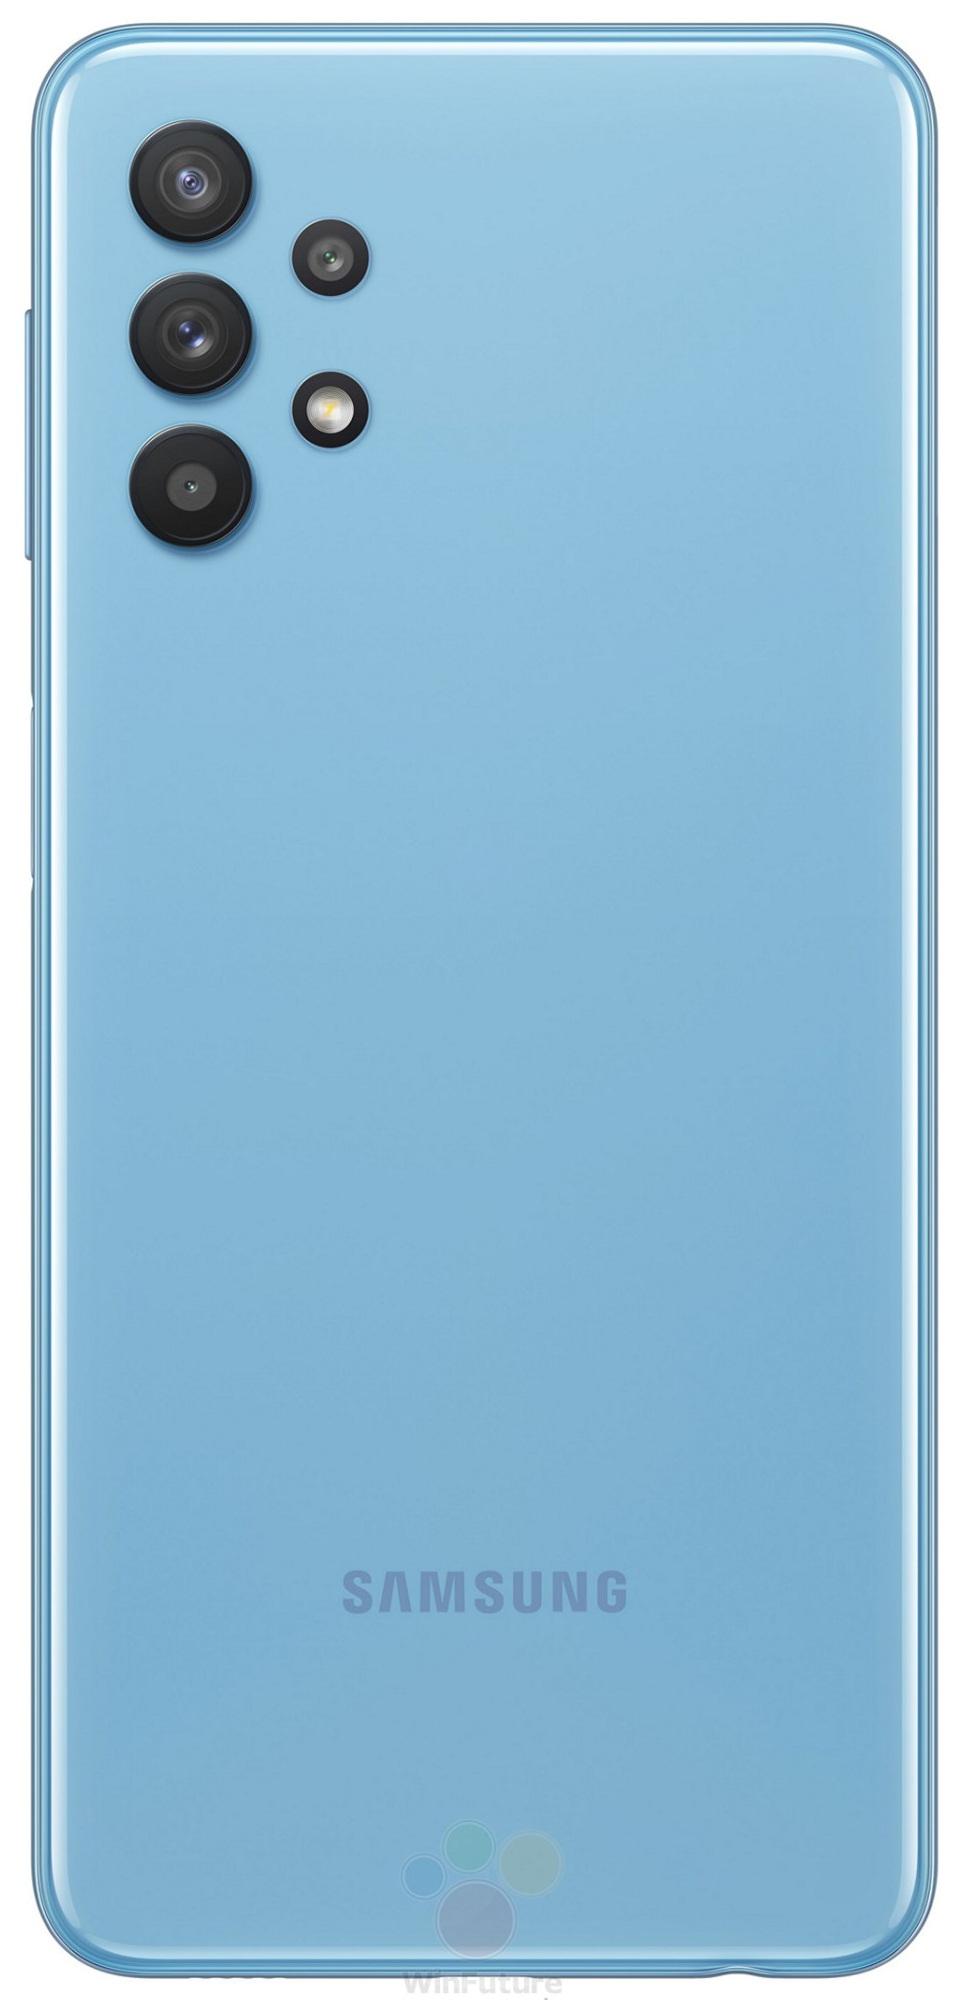 Samsung Galaxy A32: самый доступный смартфон от Samsung с 5G. Фото Samsung  - galaxy_a32_samyj_dostupnyj_samsung_s_5g_bez_bloka_pod_kameru_na_foto_9